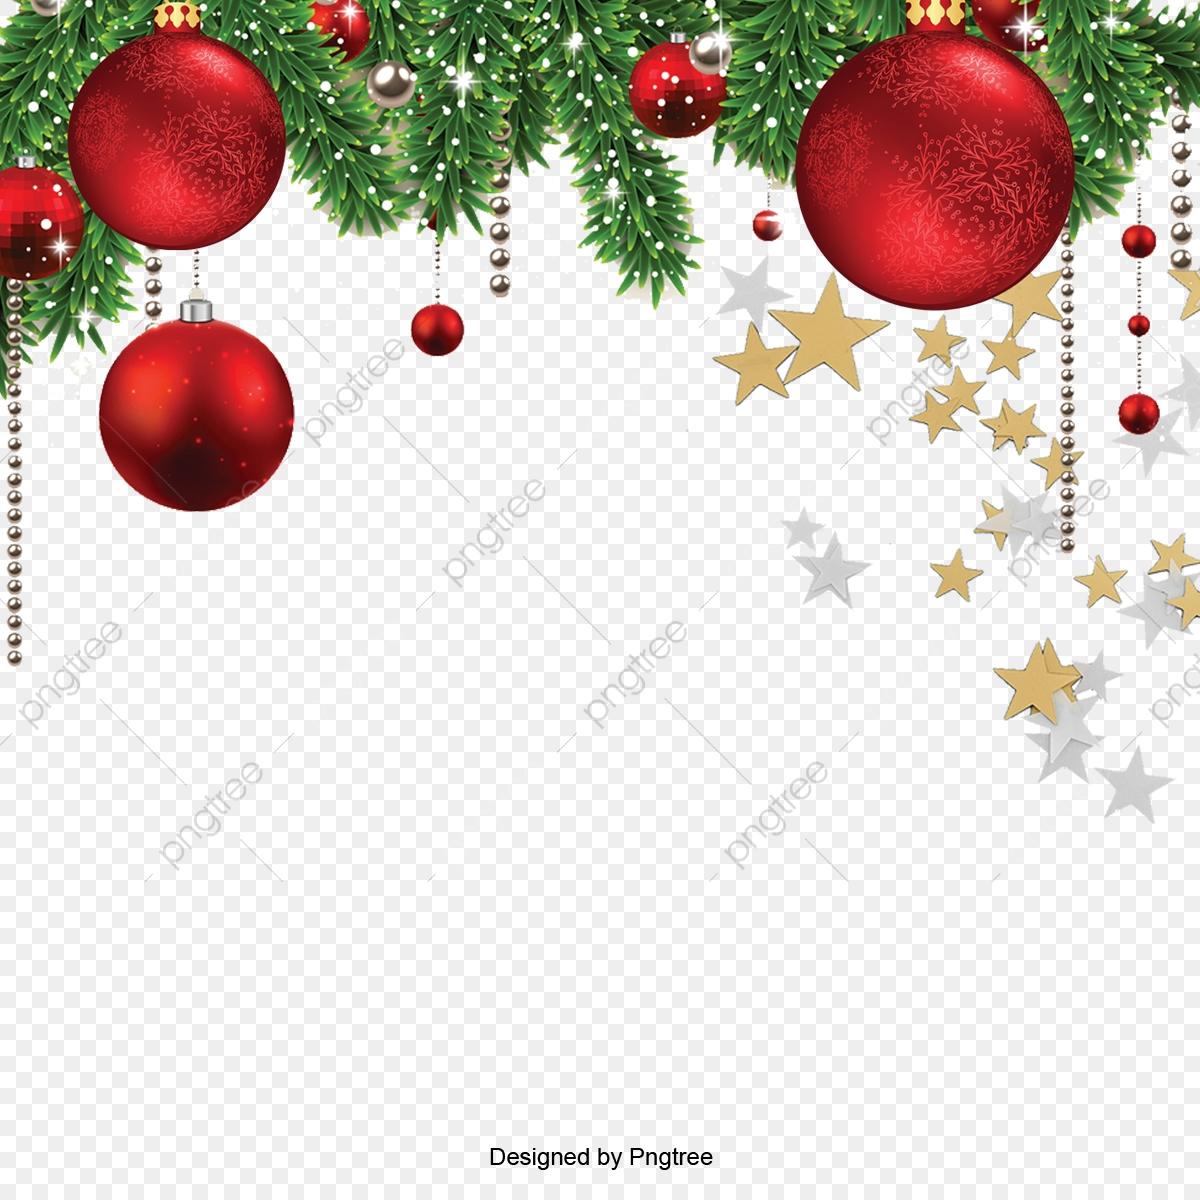 Christmas Decorations, Xmas, Ornamental Ball, Holiday Atmosphere PNG.